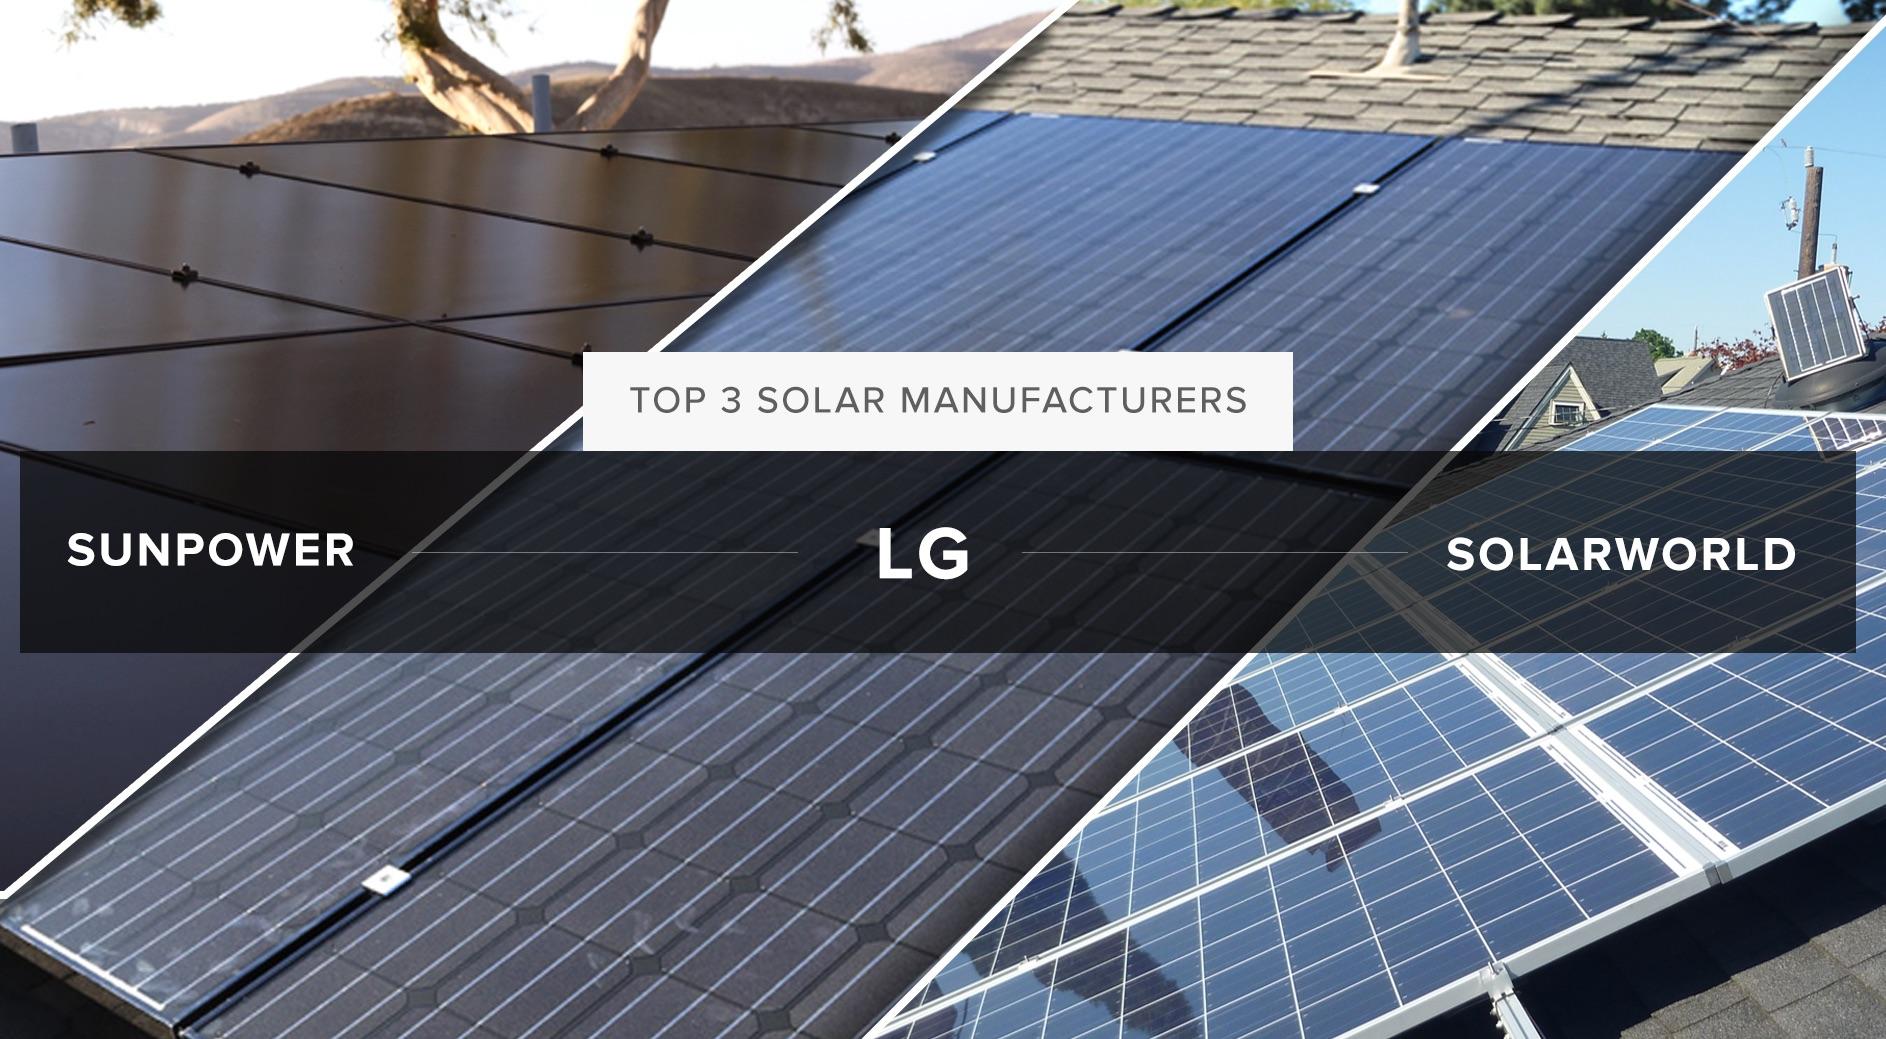 Top three solar manufacturers